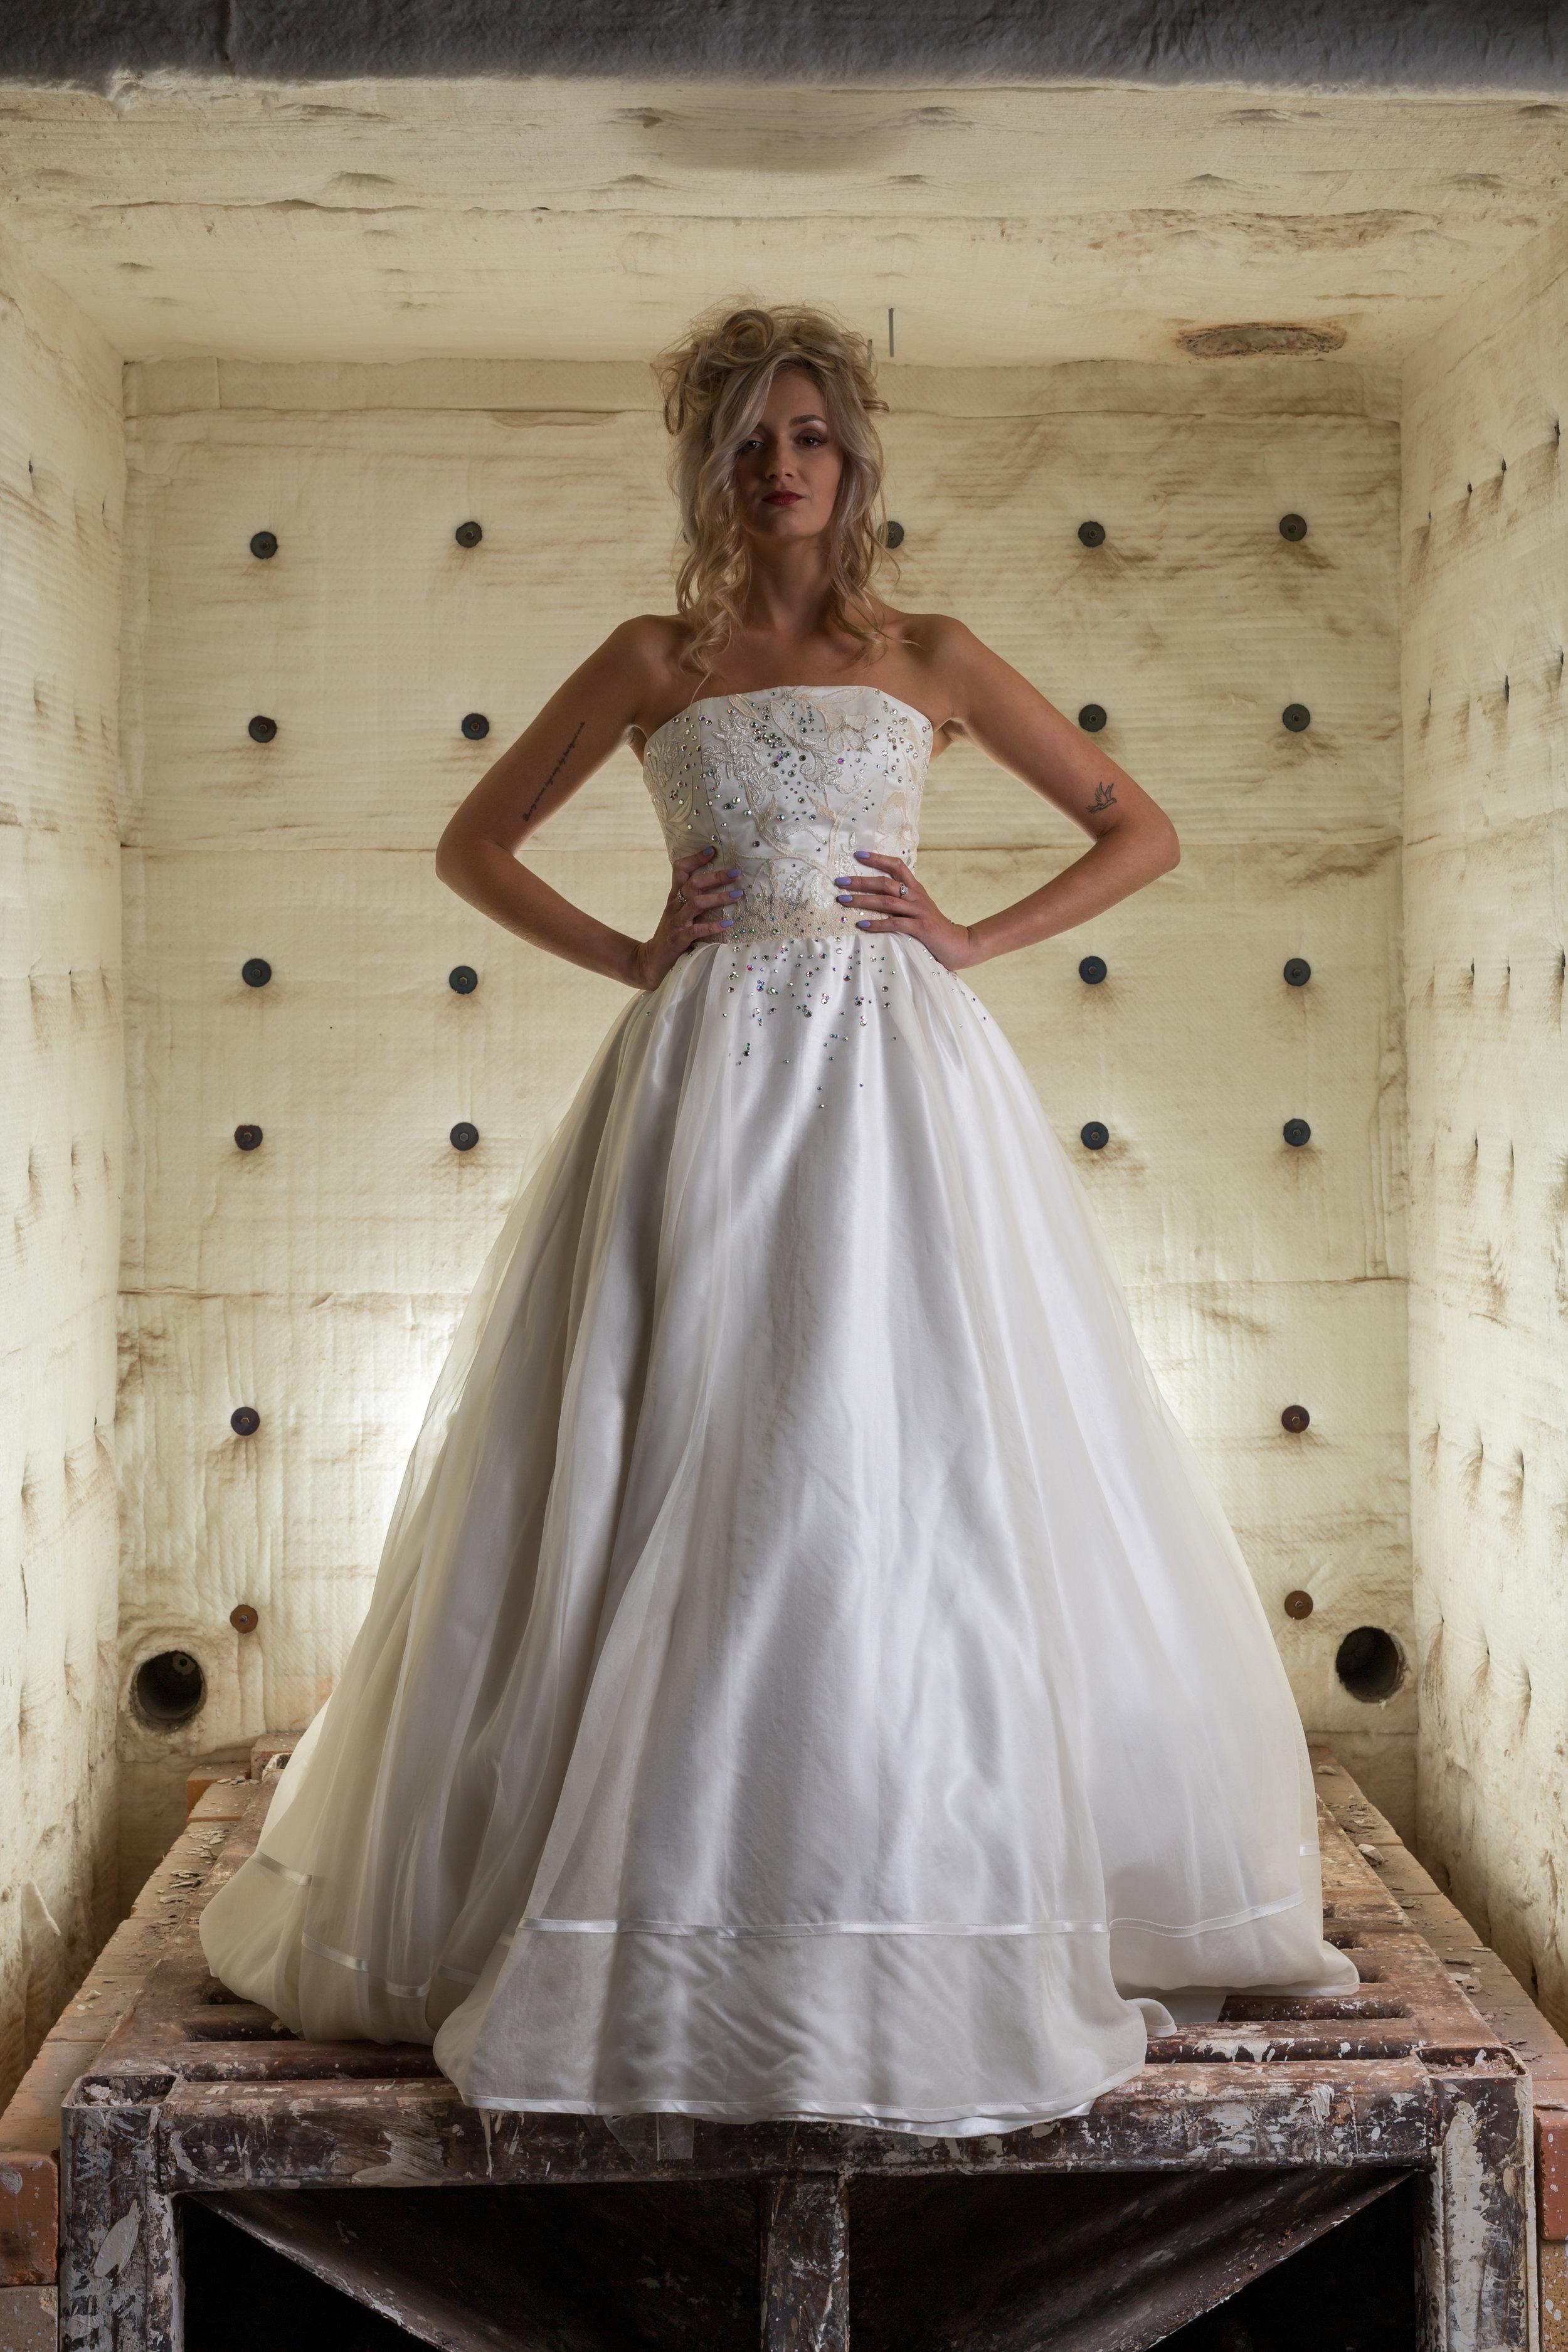 Martin Dobson Couture - Bespoke wedding dress - Suffolk - 0421 - September 17, 2017 - copyright Foyers Photography--® Robert Foyers - All Rights Reserved-3840 x 5760.JPG